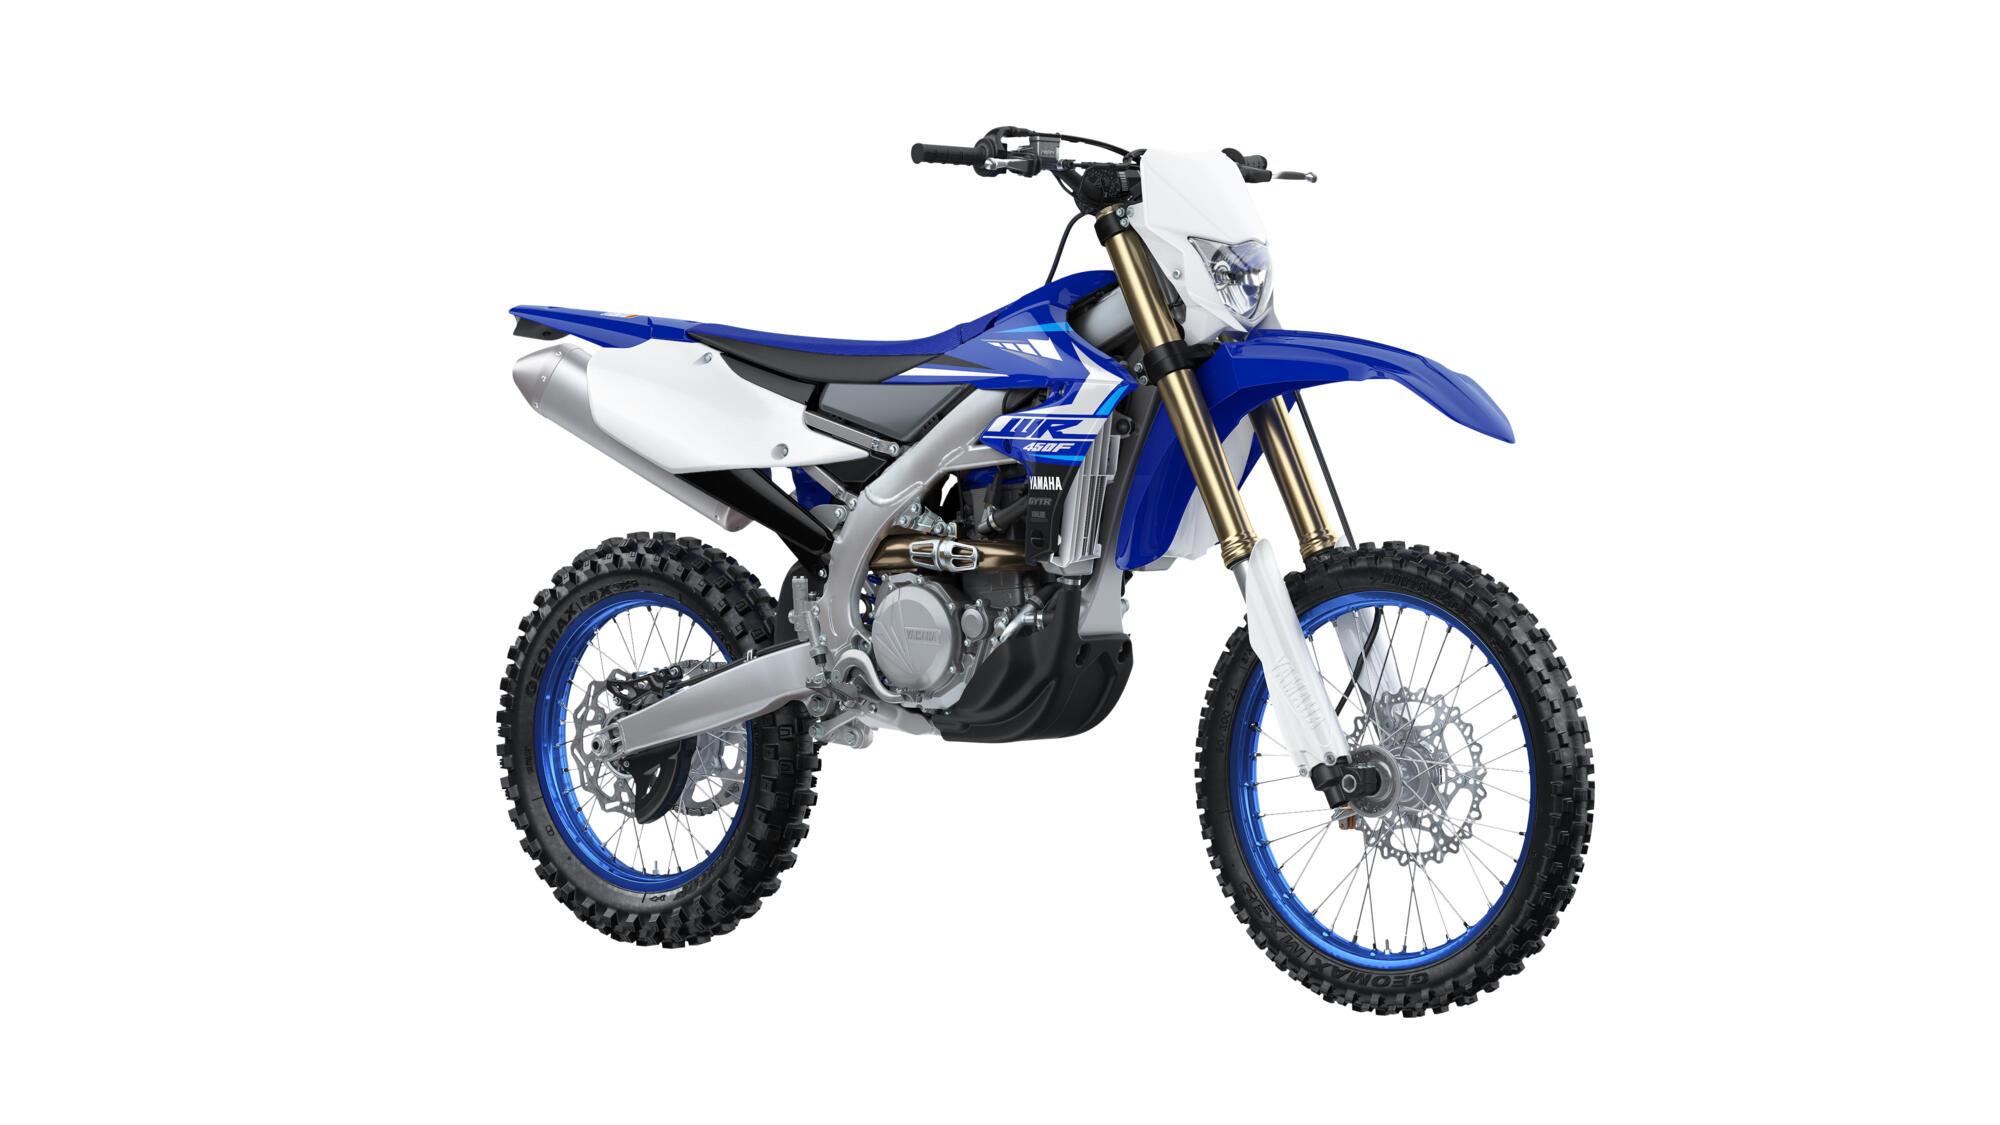 2020-Yamaha-WR450F-EU-Yamaha_Blue-Studio-001-03